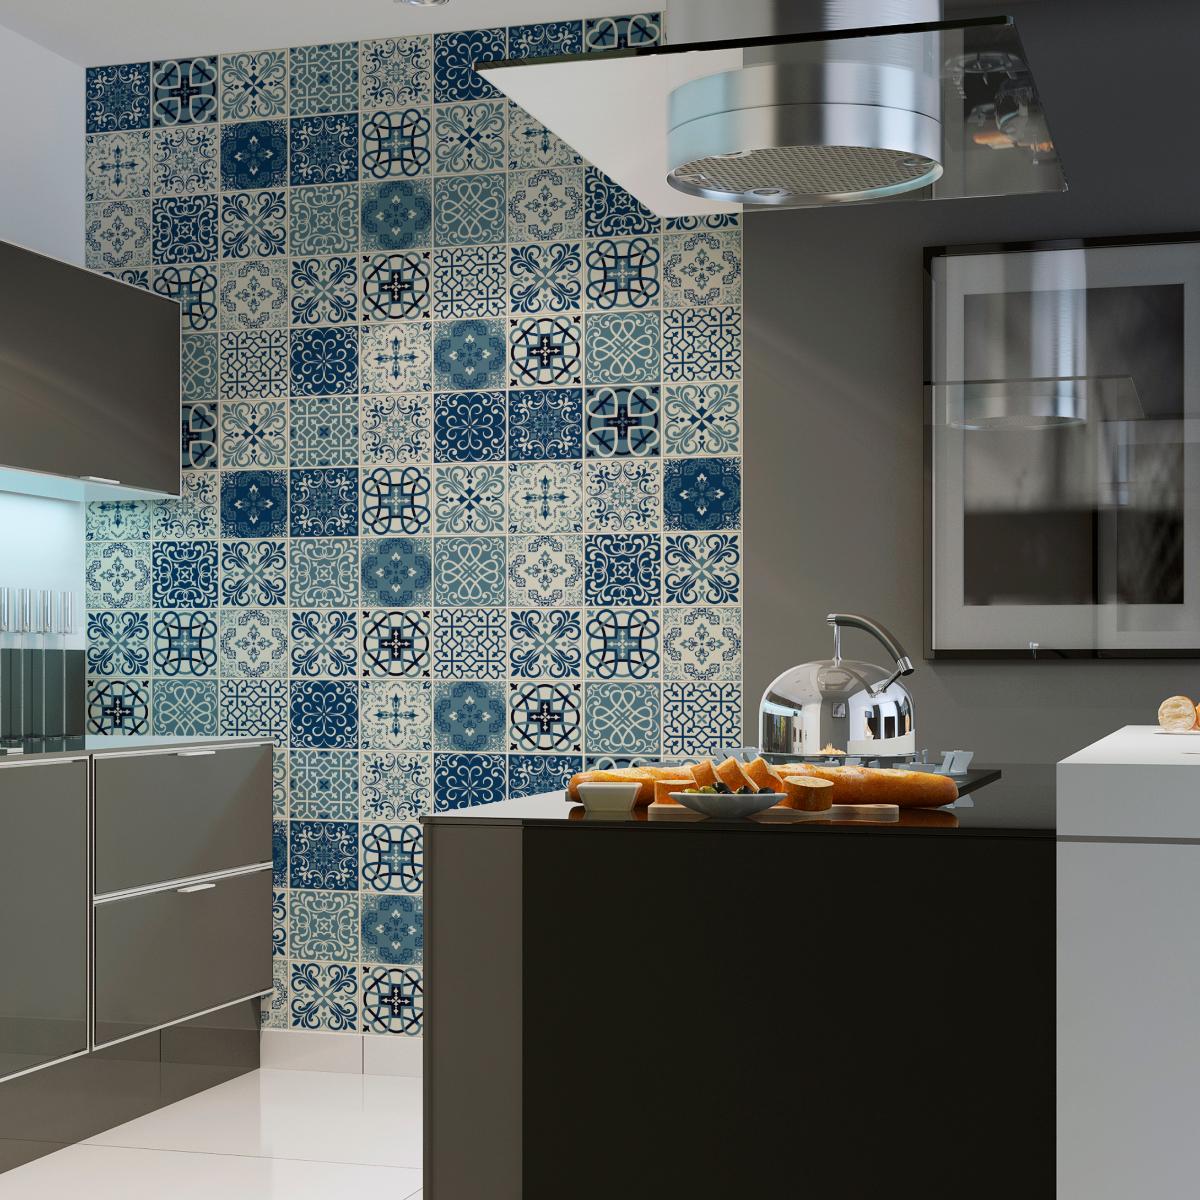 30 stickers carrelages azulejos horacio salle de bain et wc salle de bain ambiance sticker. Black Bedroom Furniture Sets. Home Design Ideas